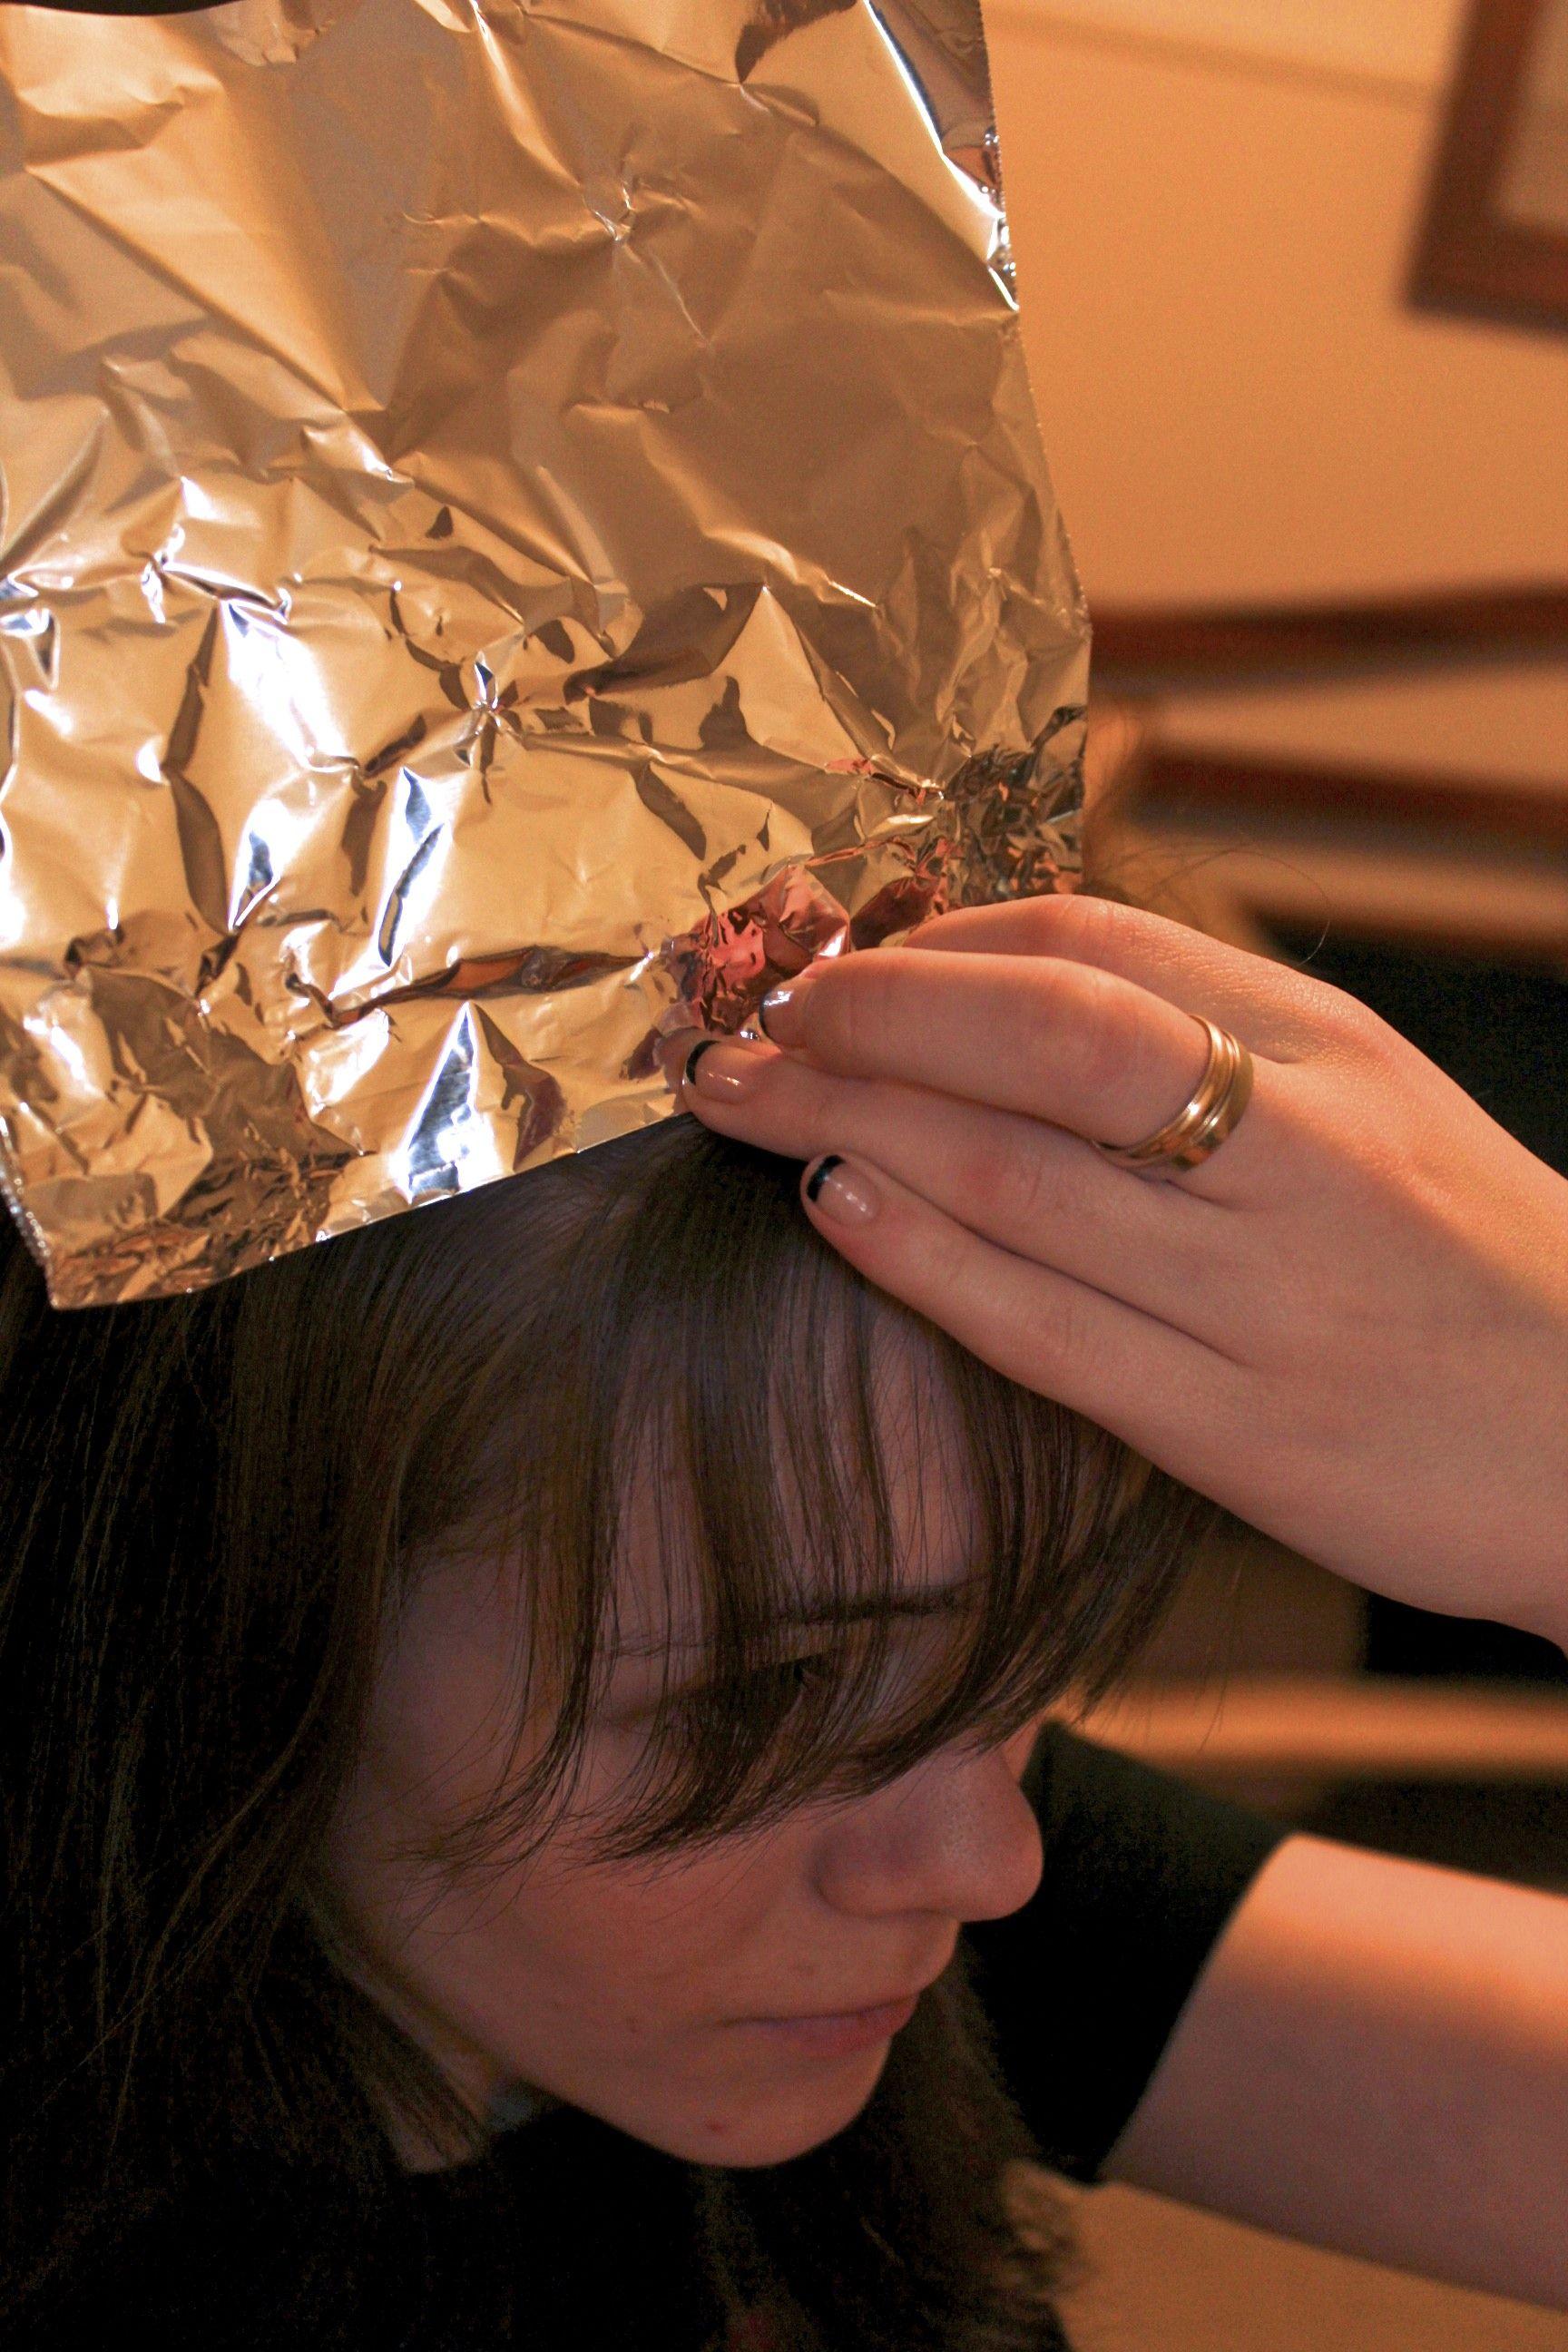 How To Lighten Hair With Hydrogen Peroxide Baking Soda Baking Soda For Hair How To Lighten Hair Baking Soda For Dandruff